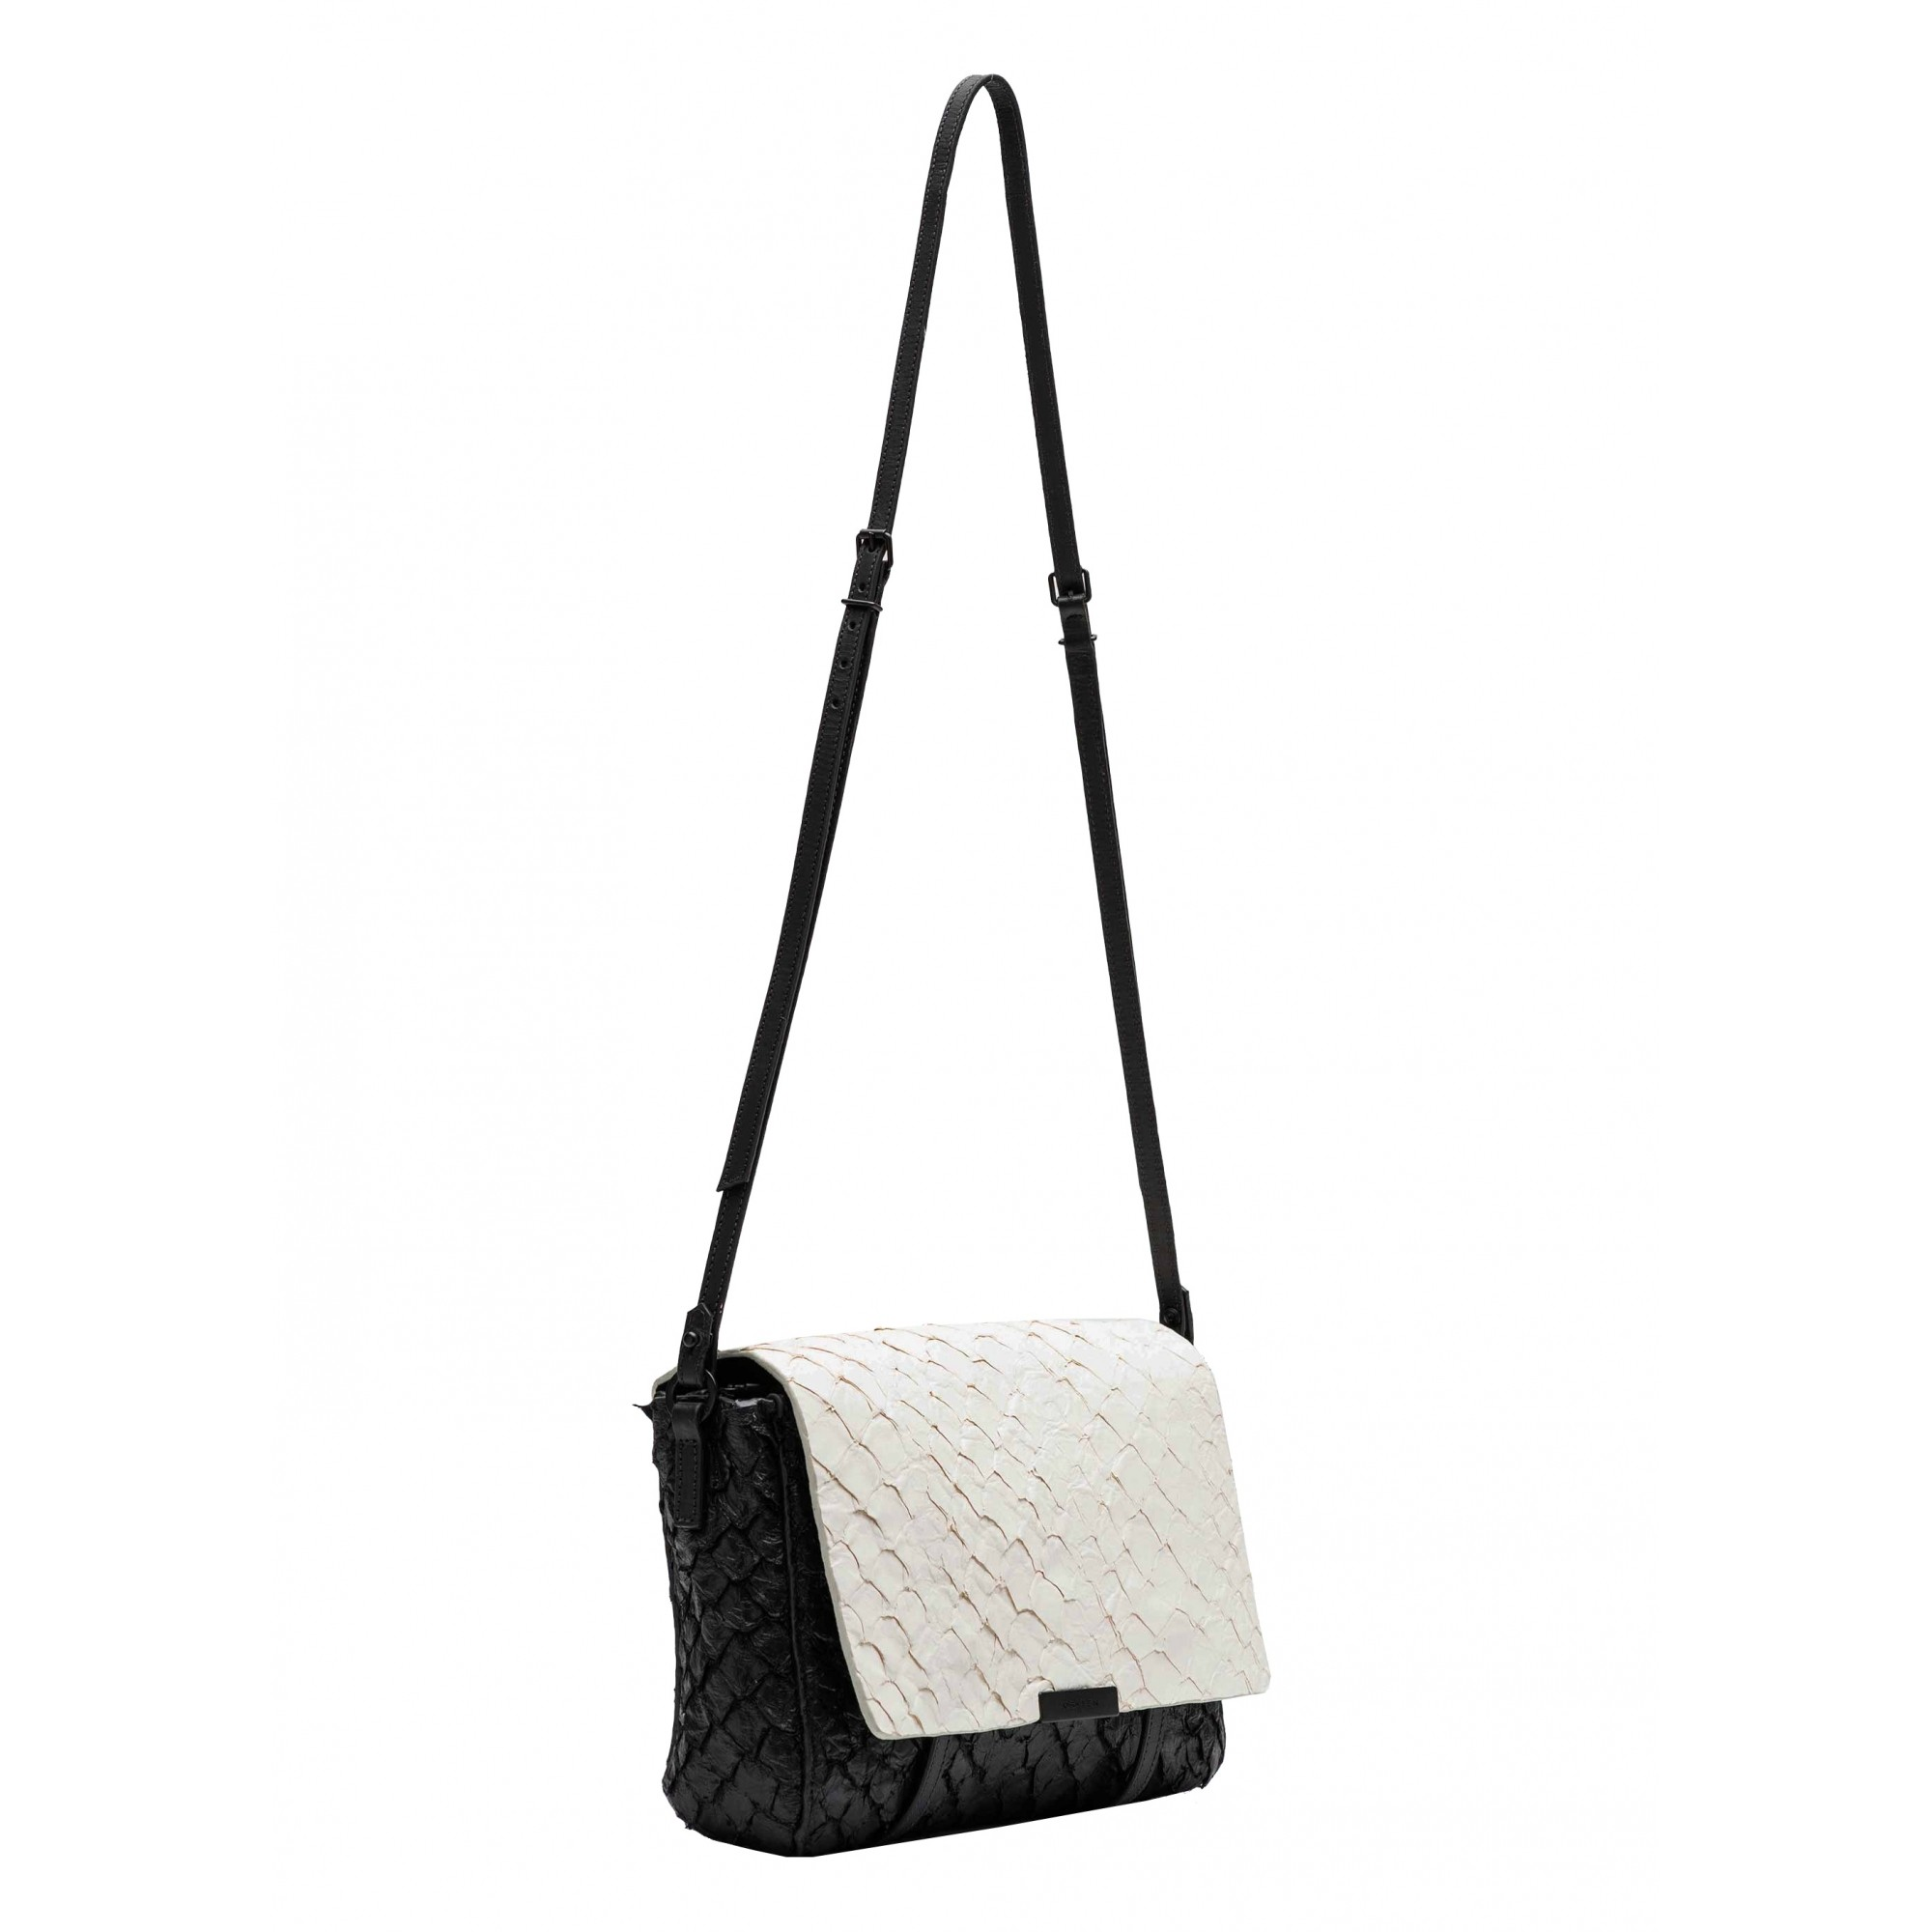 OSKLEN - PIRARUCU FLAP COLOUR BAG FORN:62597